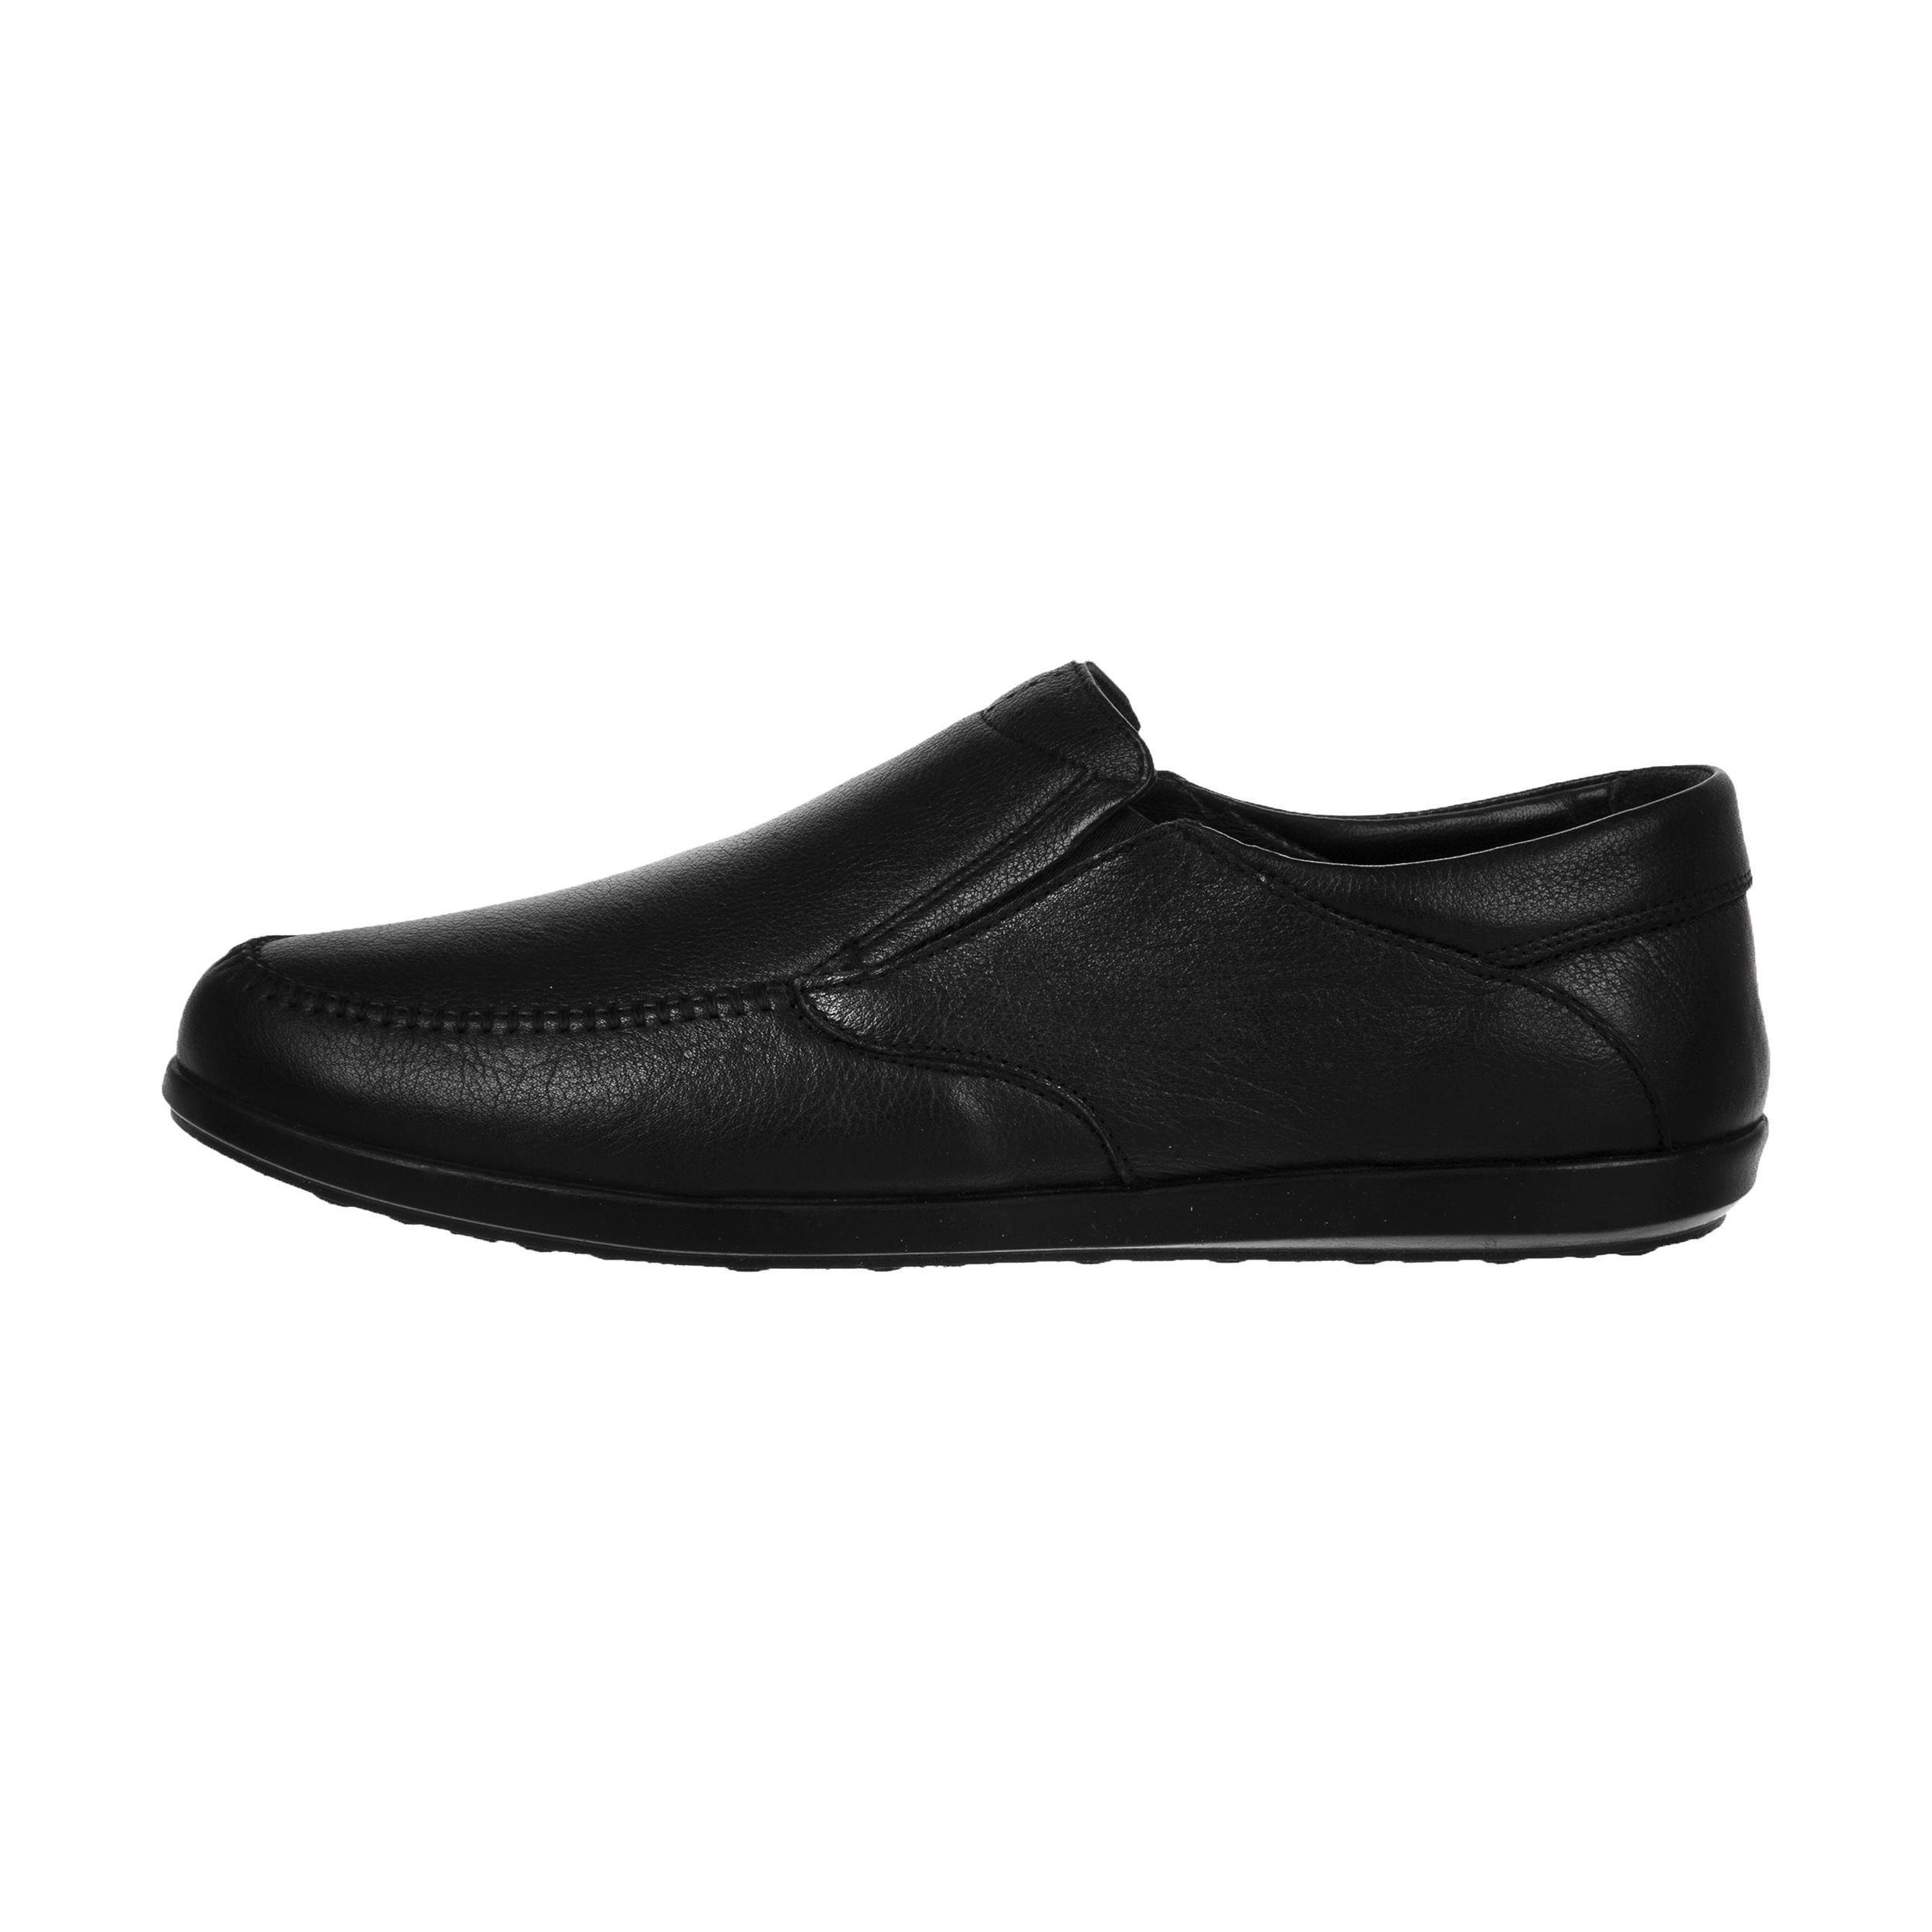 کفش روزمره مردانه فلوگارت مدل 100317221-101